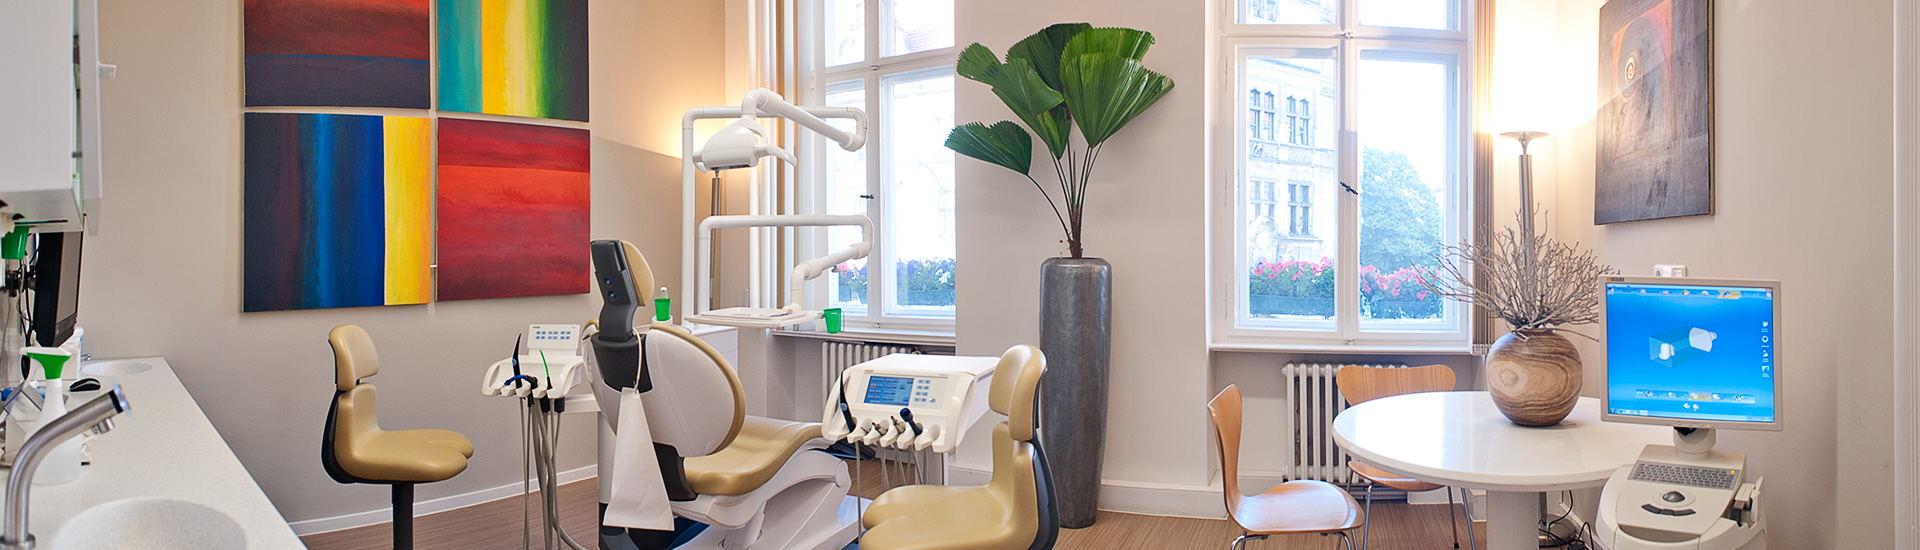 Zahnzentrum-Neukolln-Berlin-Behandlungsraum-Zahnarzt-Althoff